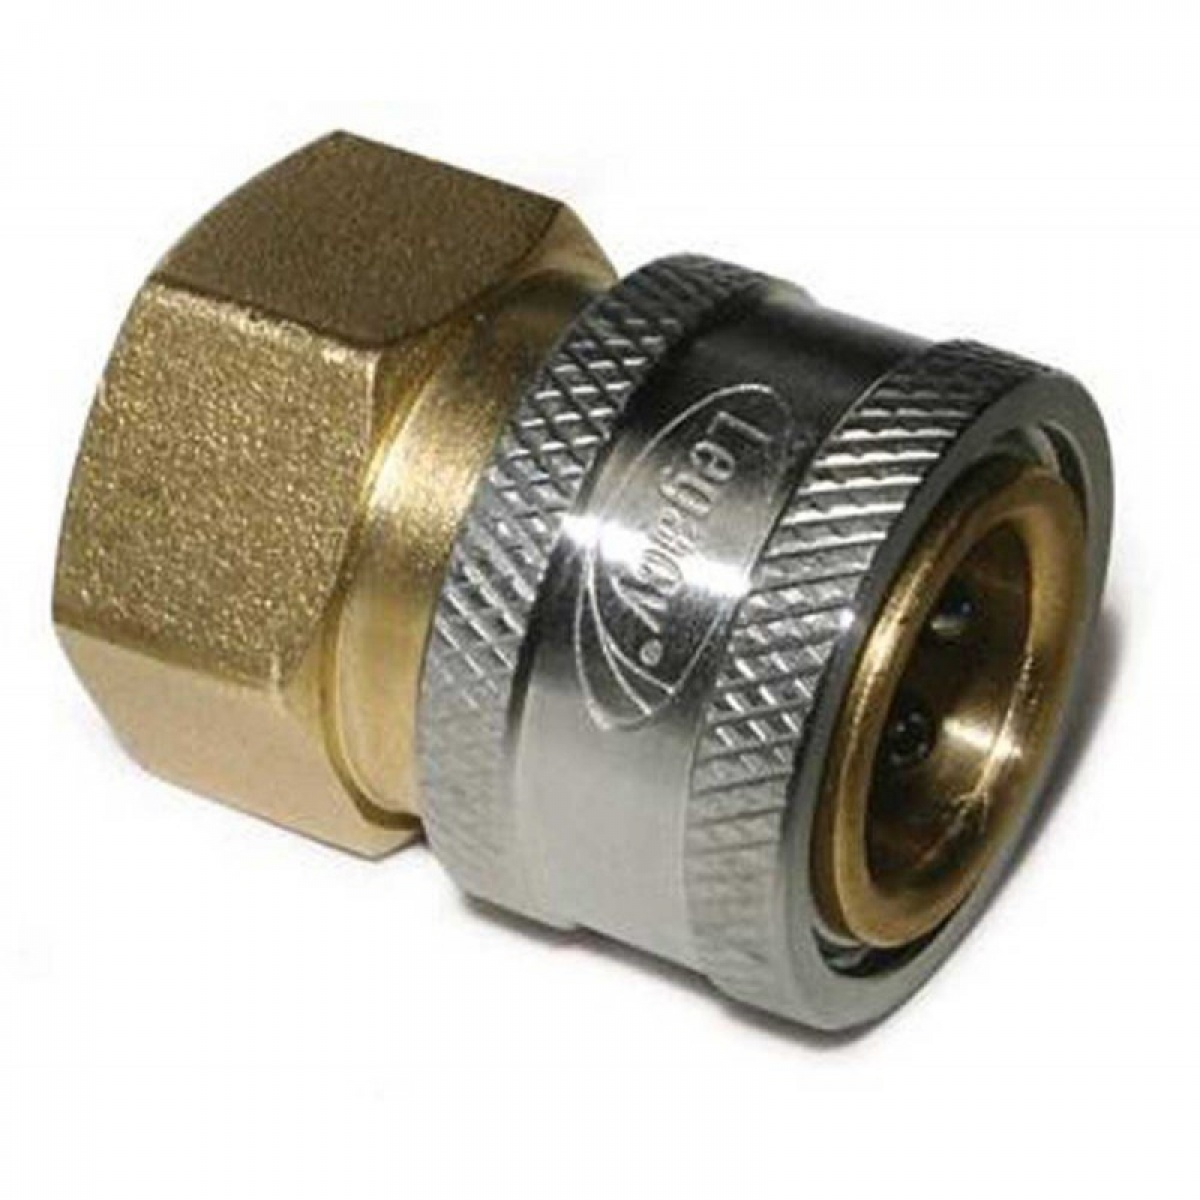 "Case200(98021640)socket Qc 1/4"" Fpt Br"